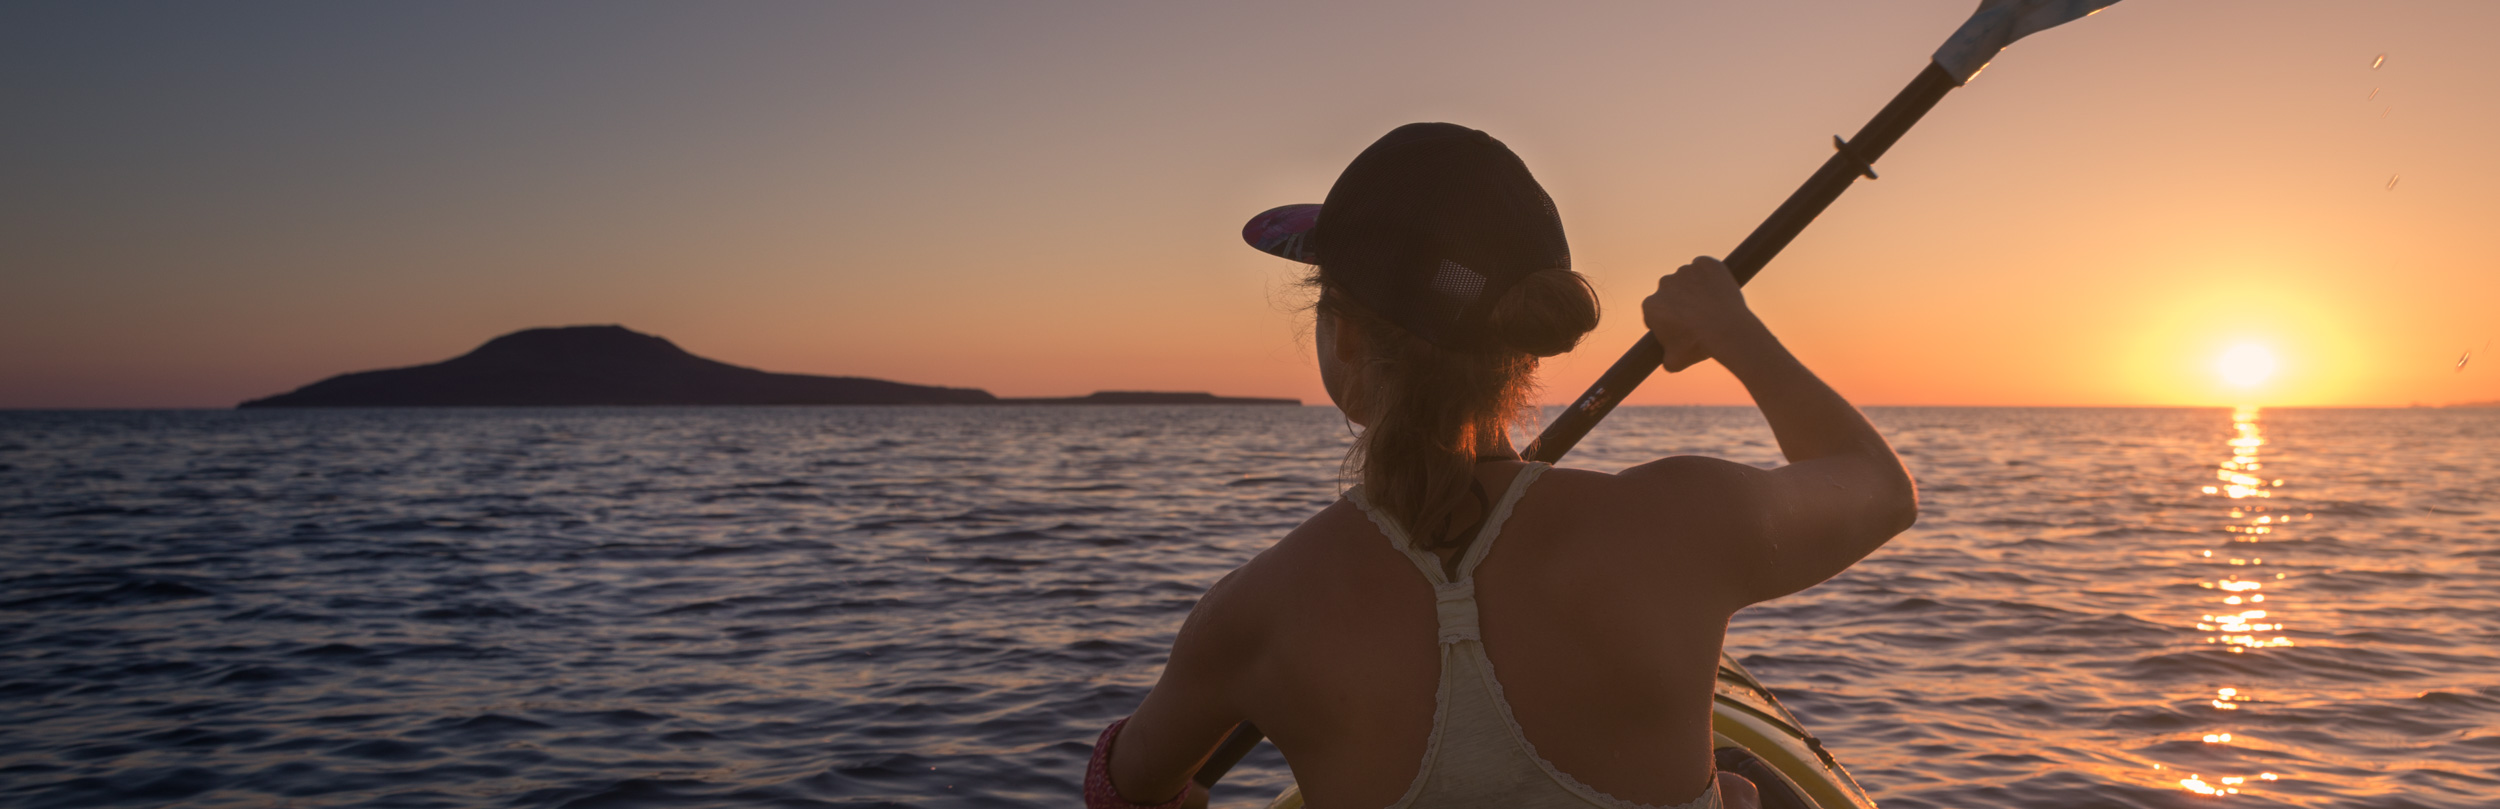 Woman Kayaking on Gulf of California to Coronado Island.jpg